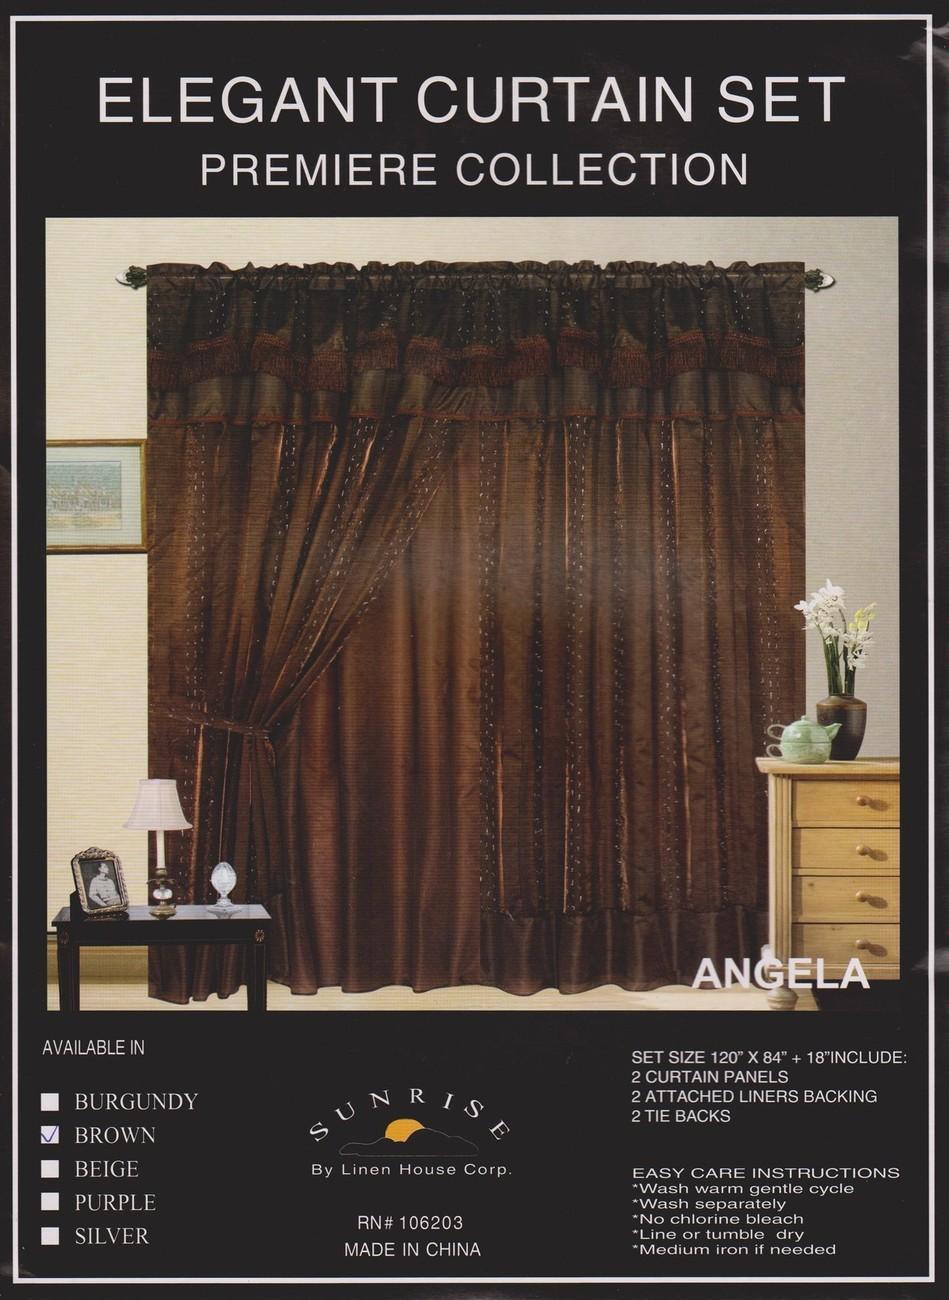 "New Elegant Curtain / Drape Set + Valance + Backing + Tie Backs ""Angela"" BROWN"